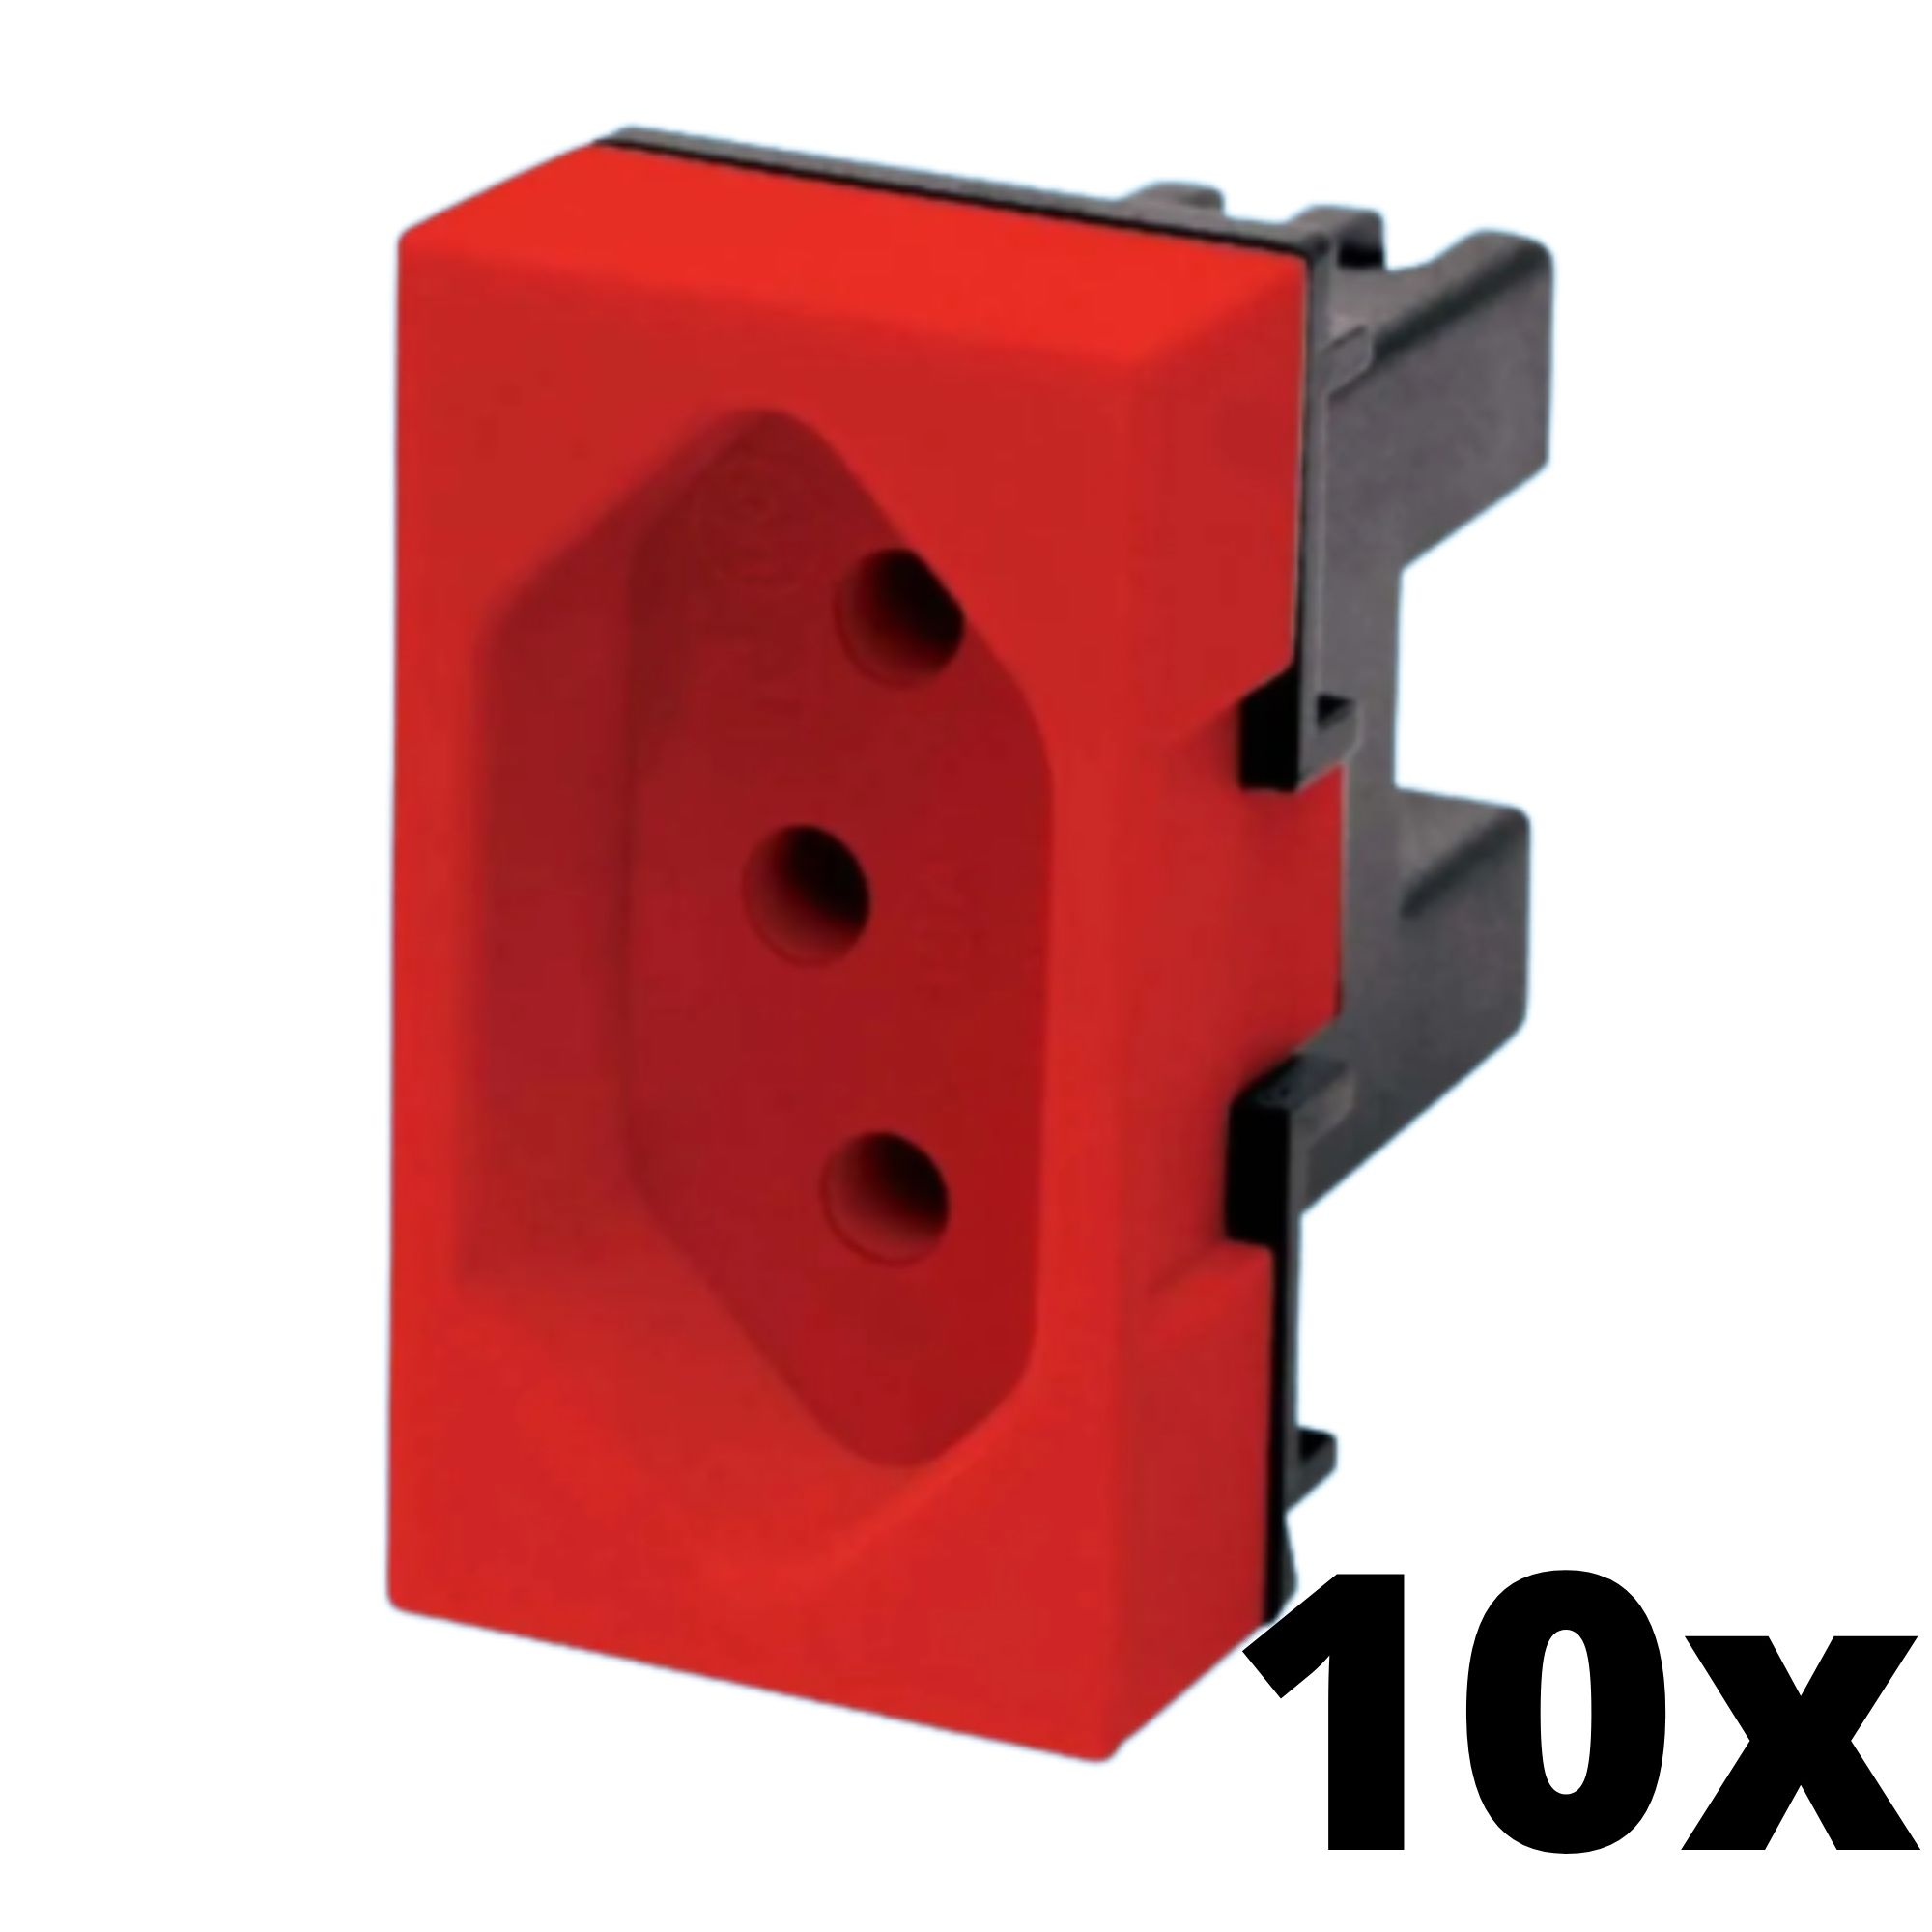 Kit 10 und Evidence Módulo de Tomada 20A Vermelha